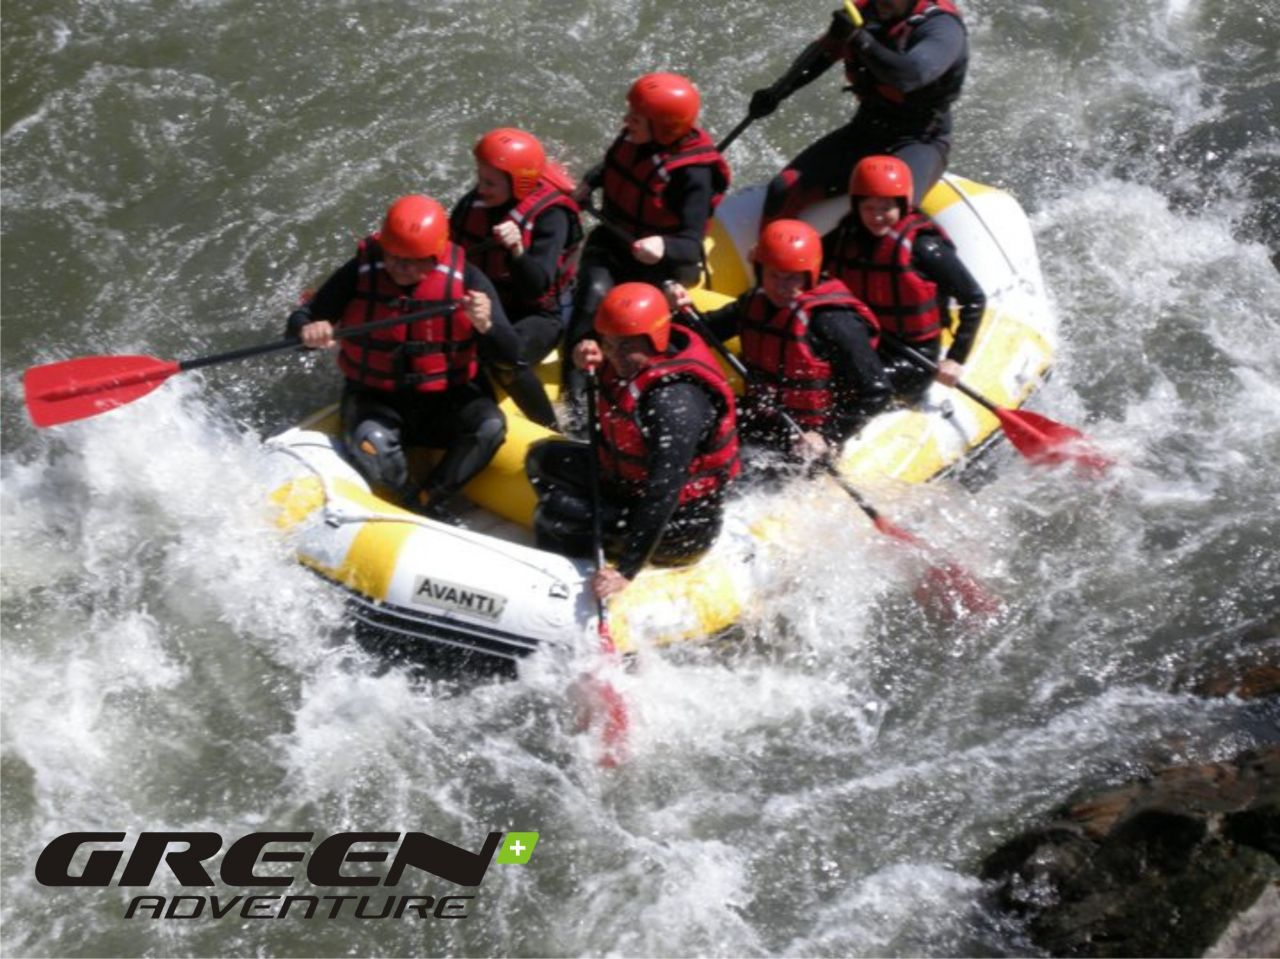 Rafting pe Jiu cu echipa Green Adventure